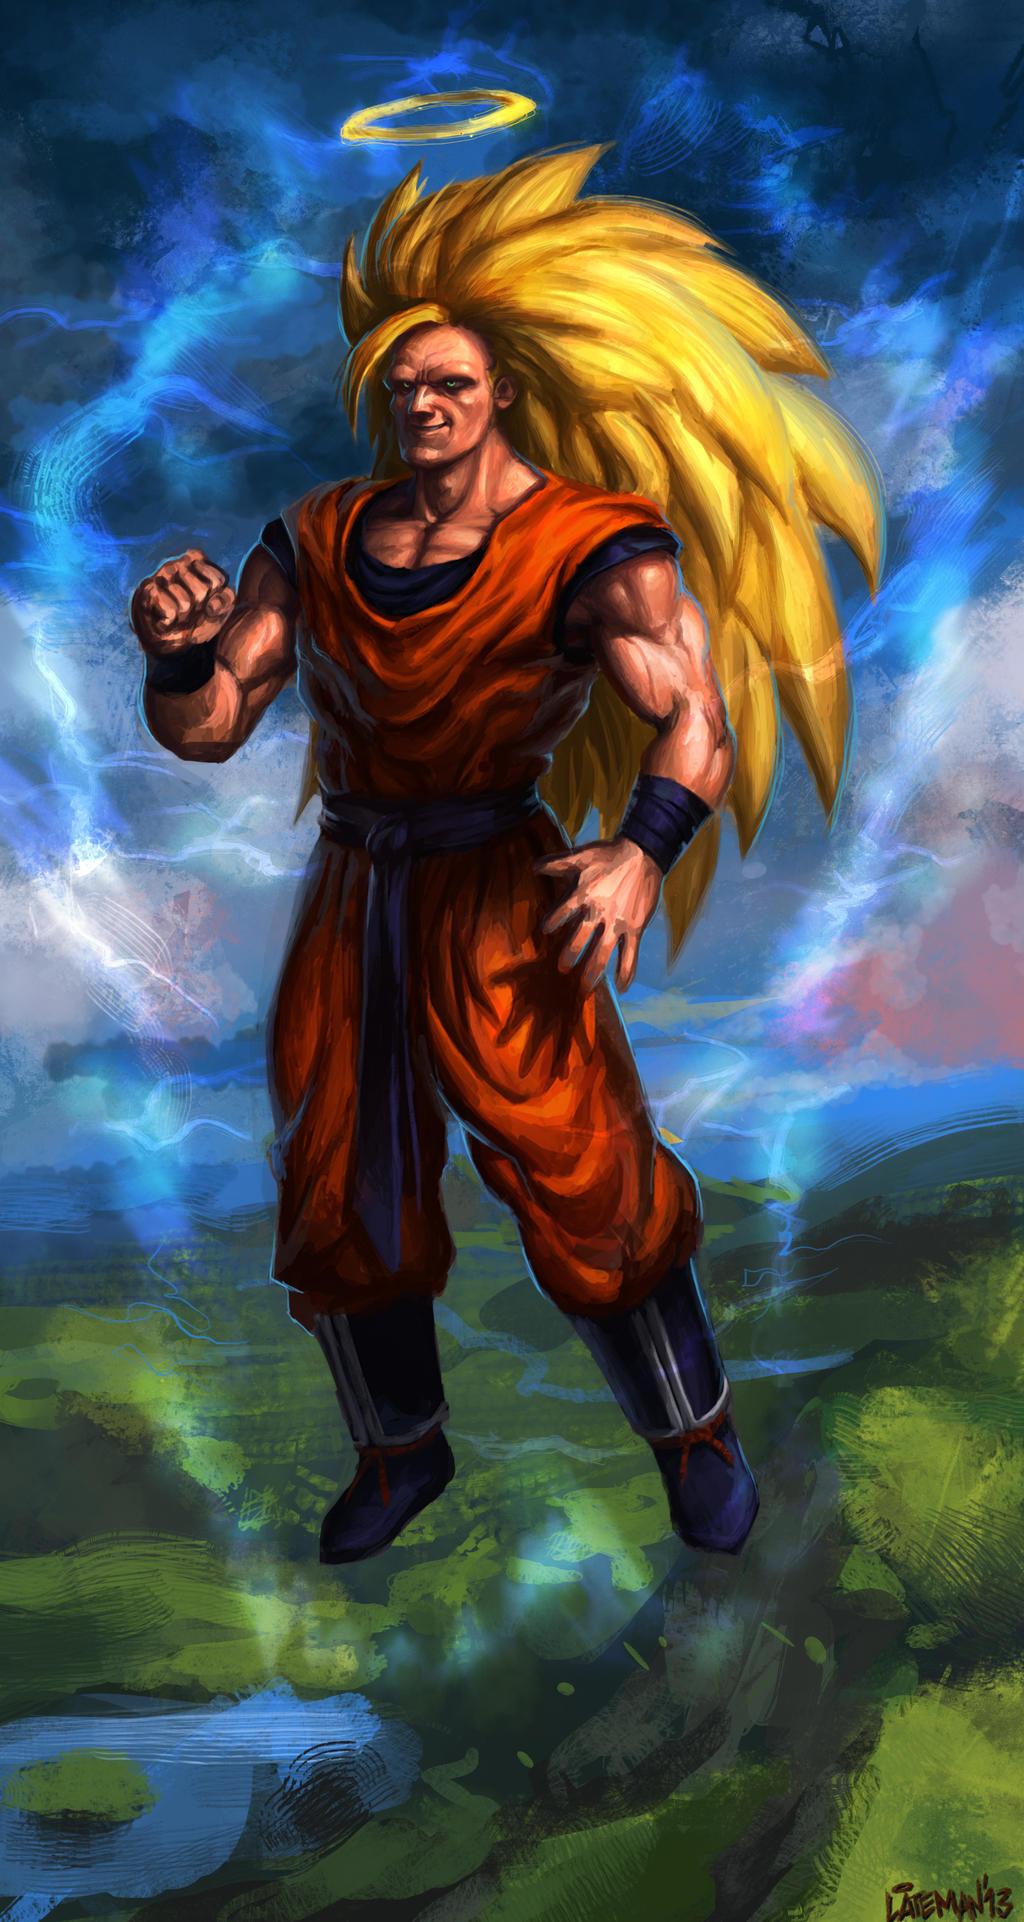 Goku Super Saiyan 10000000000000000000000000000000000000000000000000000000000 Goku Super Saiyan leve...